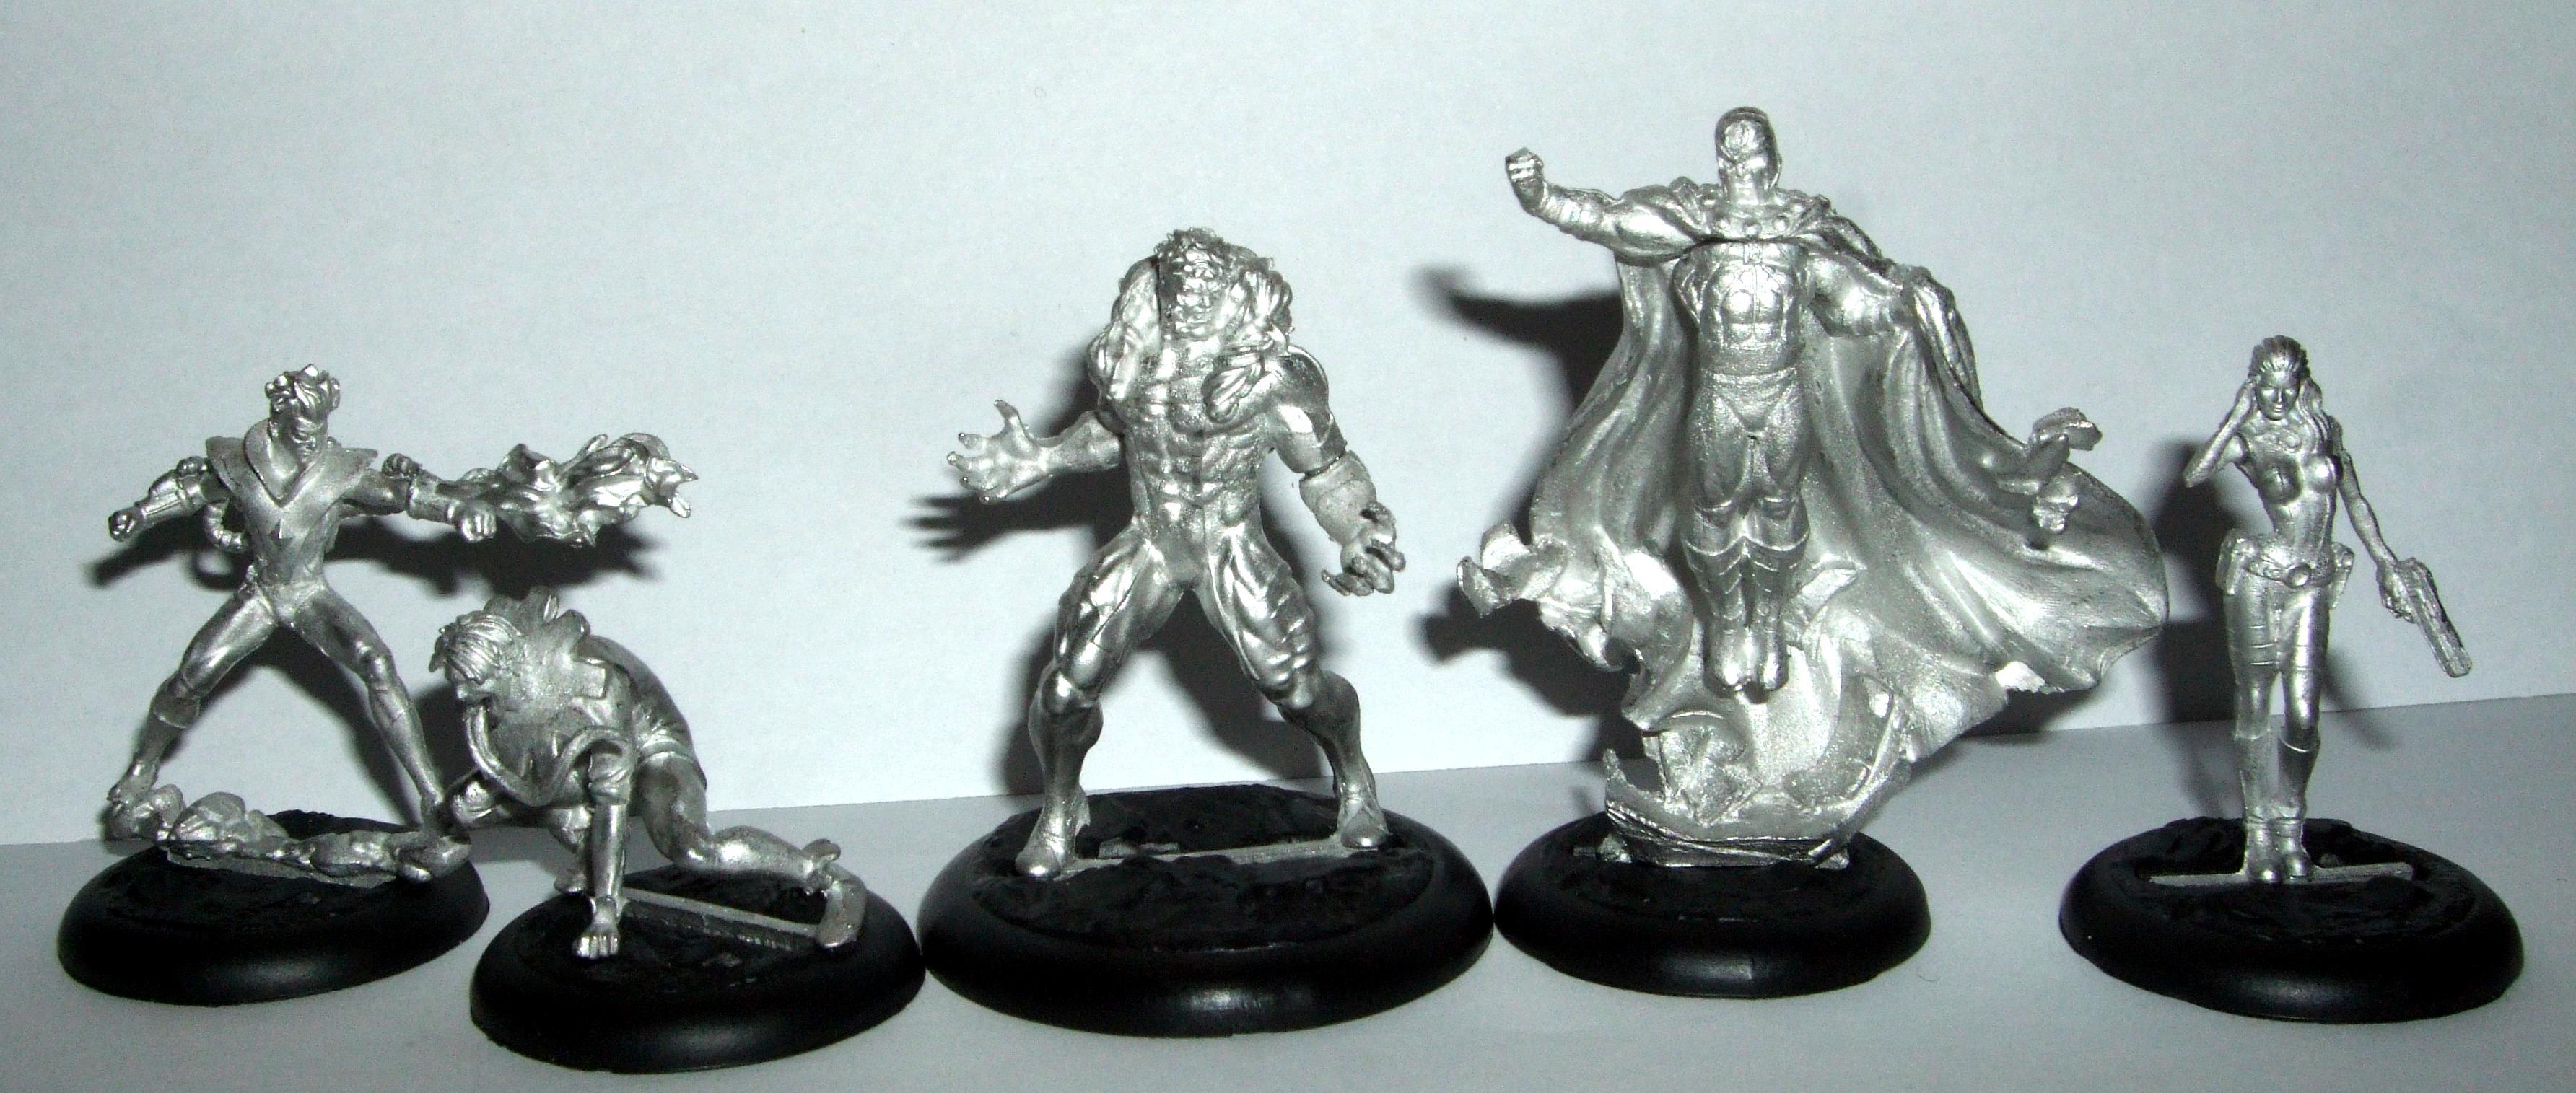 Knightmodels, Magneto, Marvel, Mastermind, Pyro, Sabertooth, Sabretooth, Toad, X-men